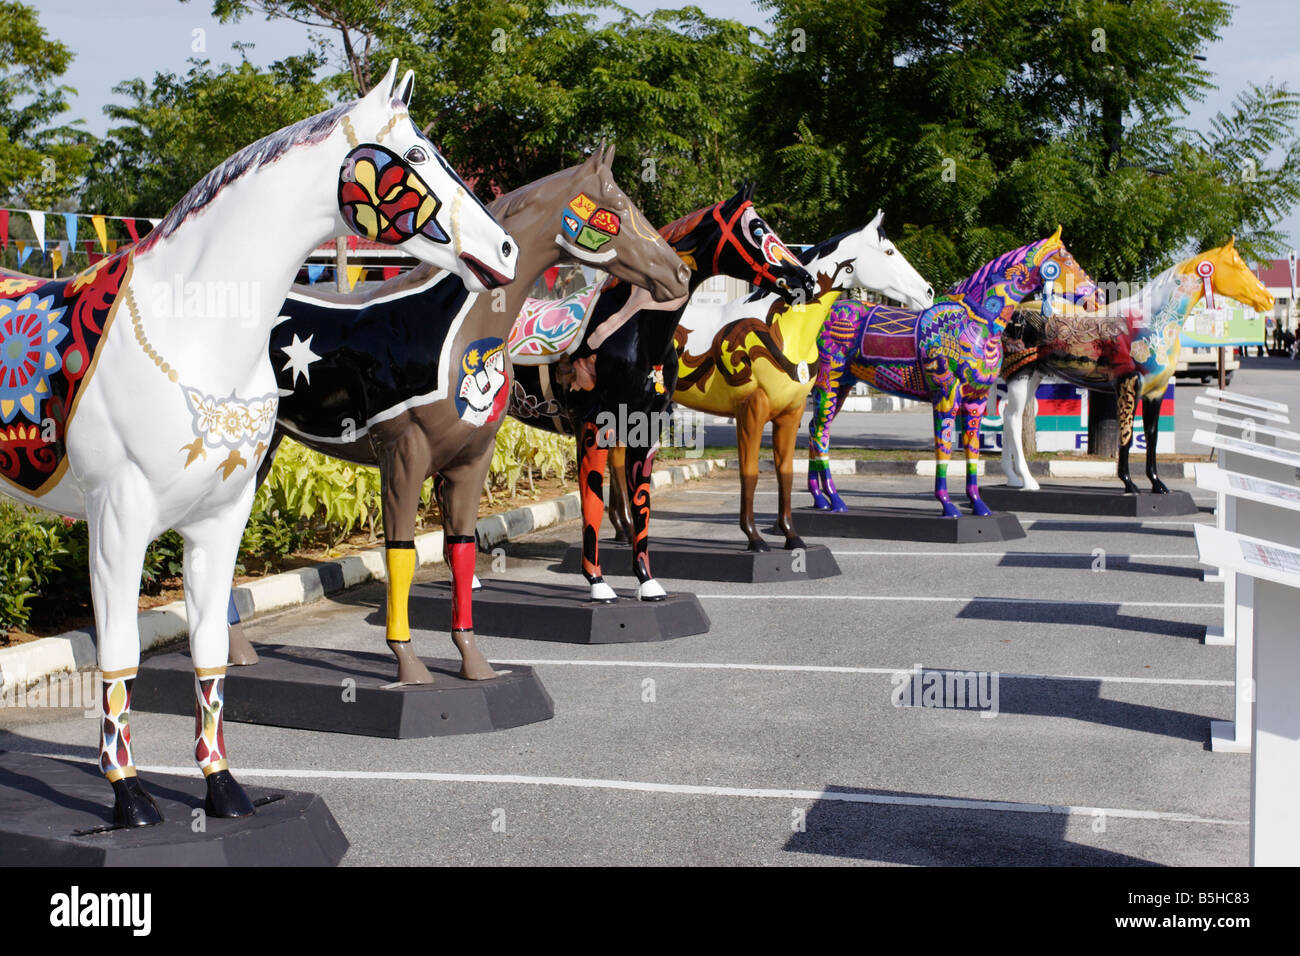 Beautifully painted horse statue in Terengganu, Malaysia. - Stock Image